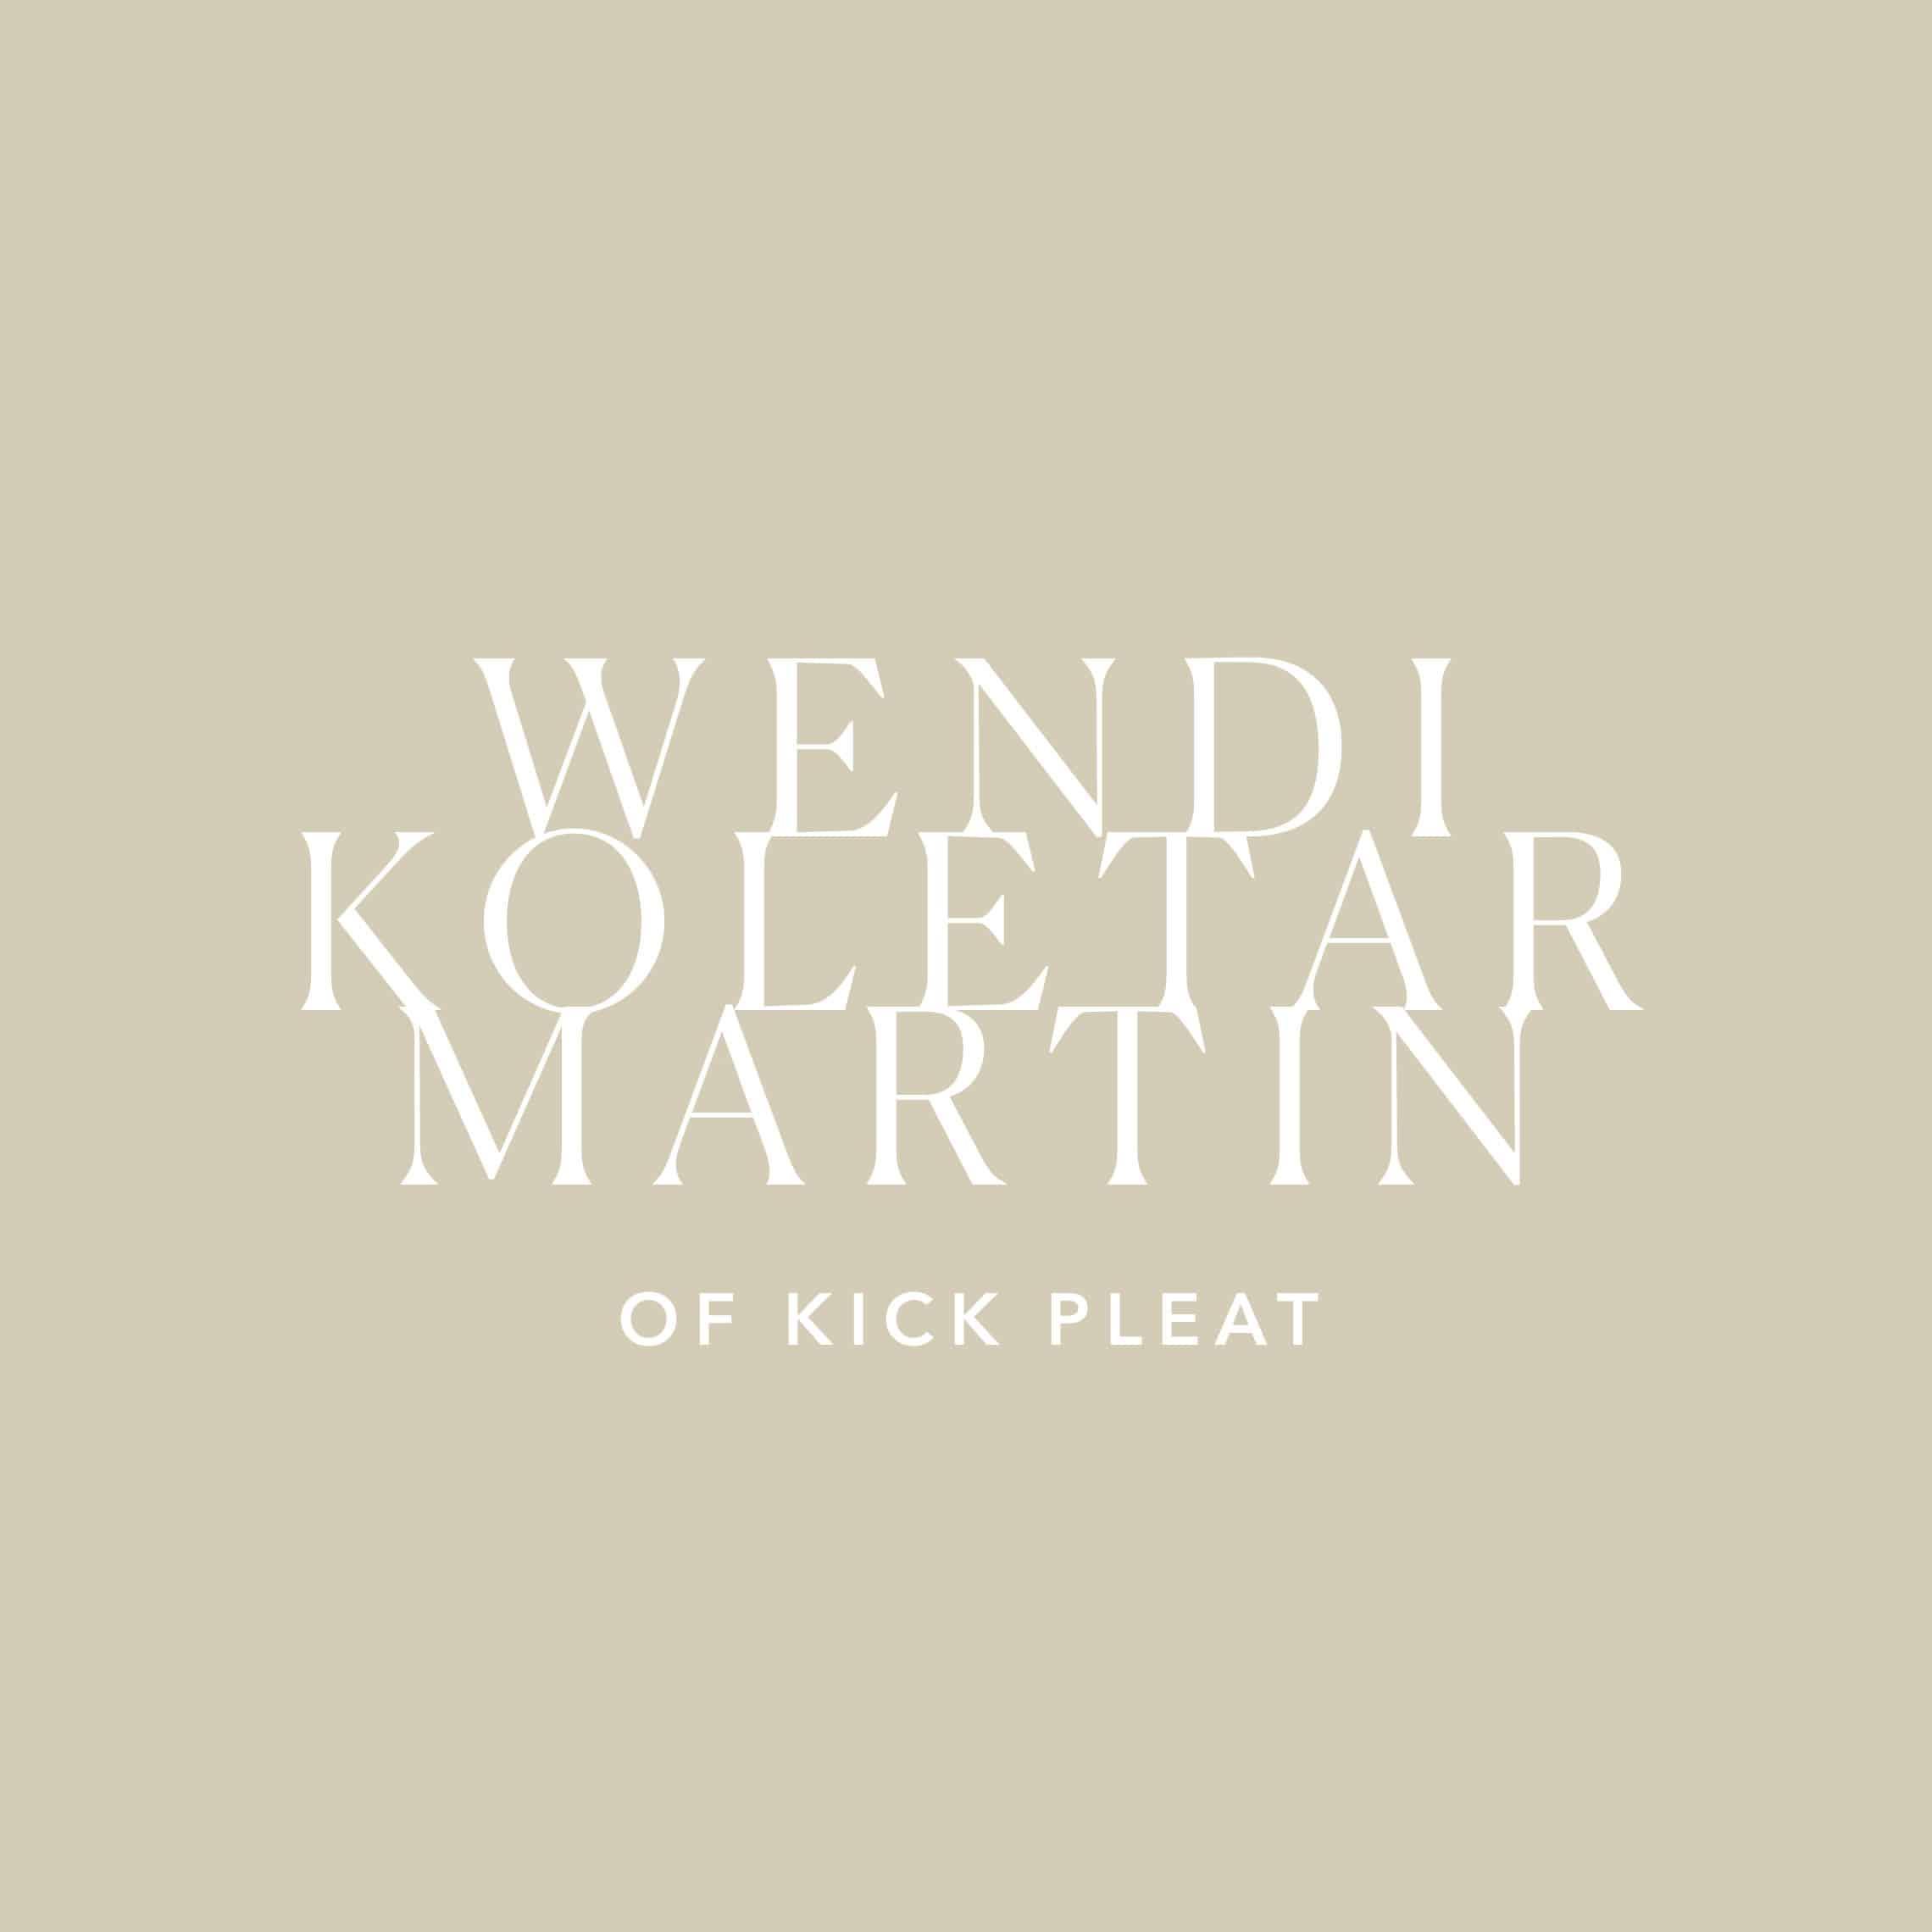 The Gift Guide Series: Wendi Koletar Martin 24